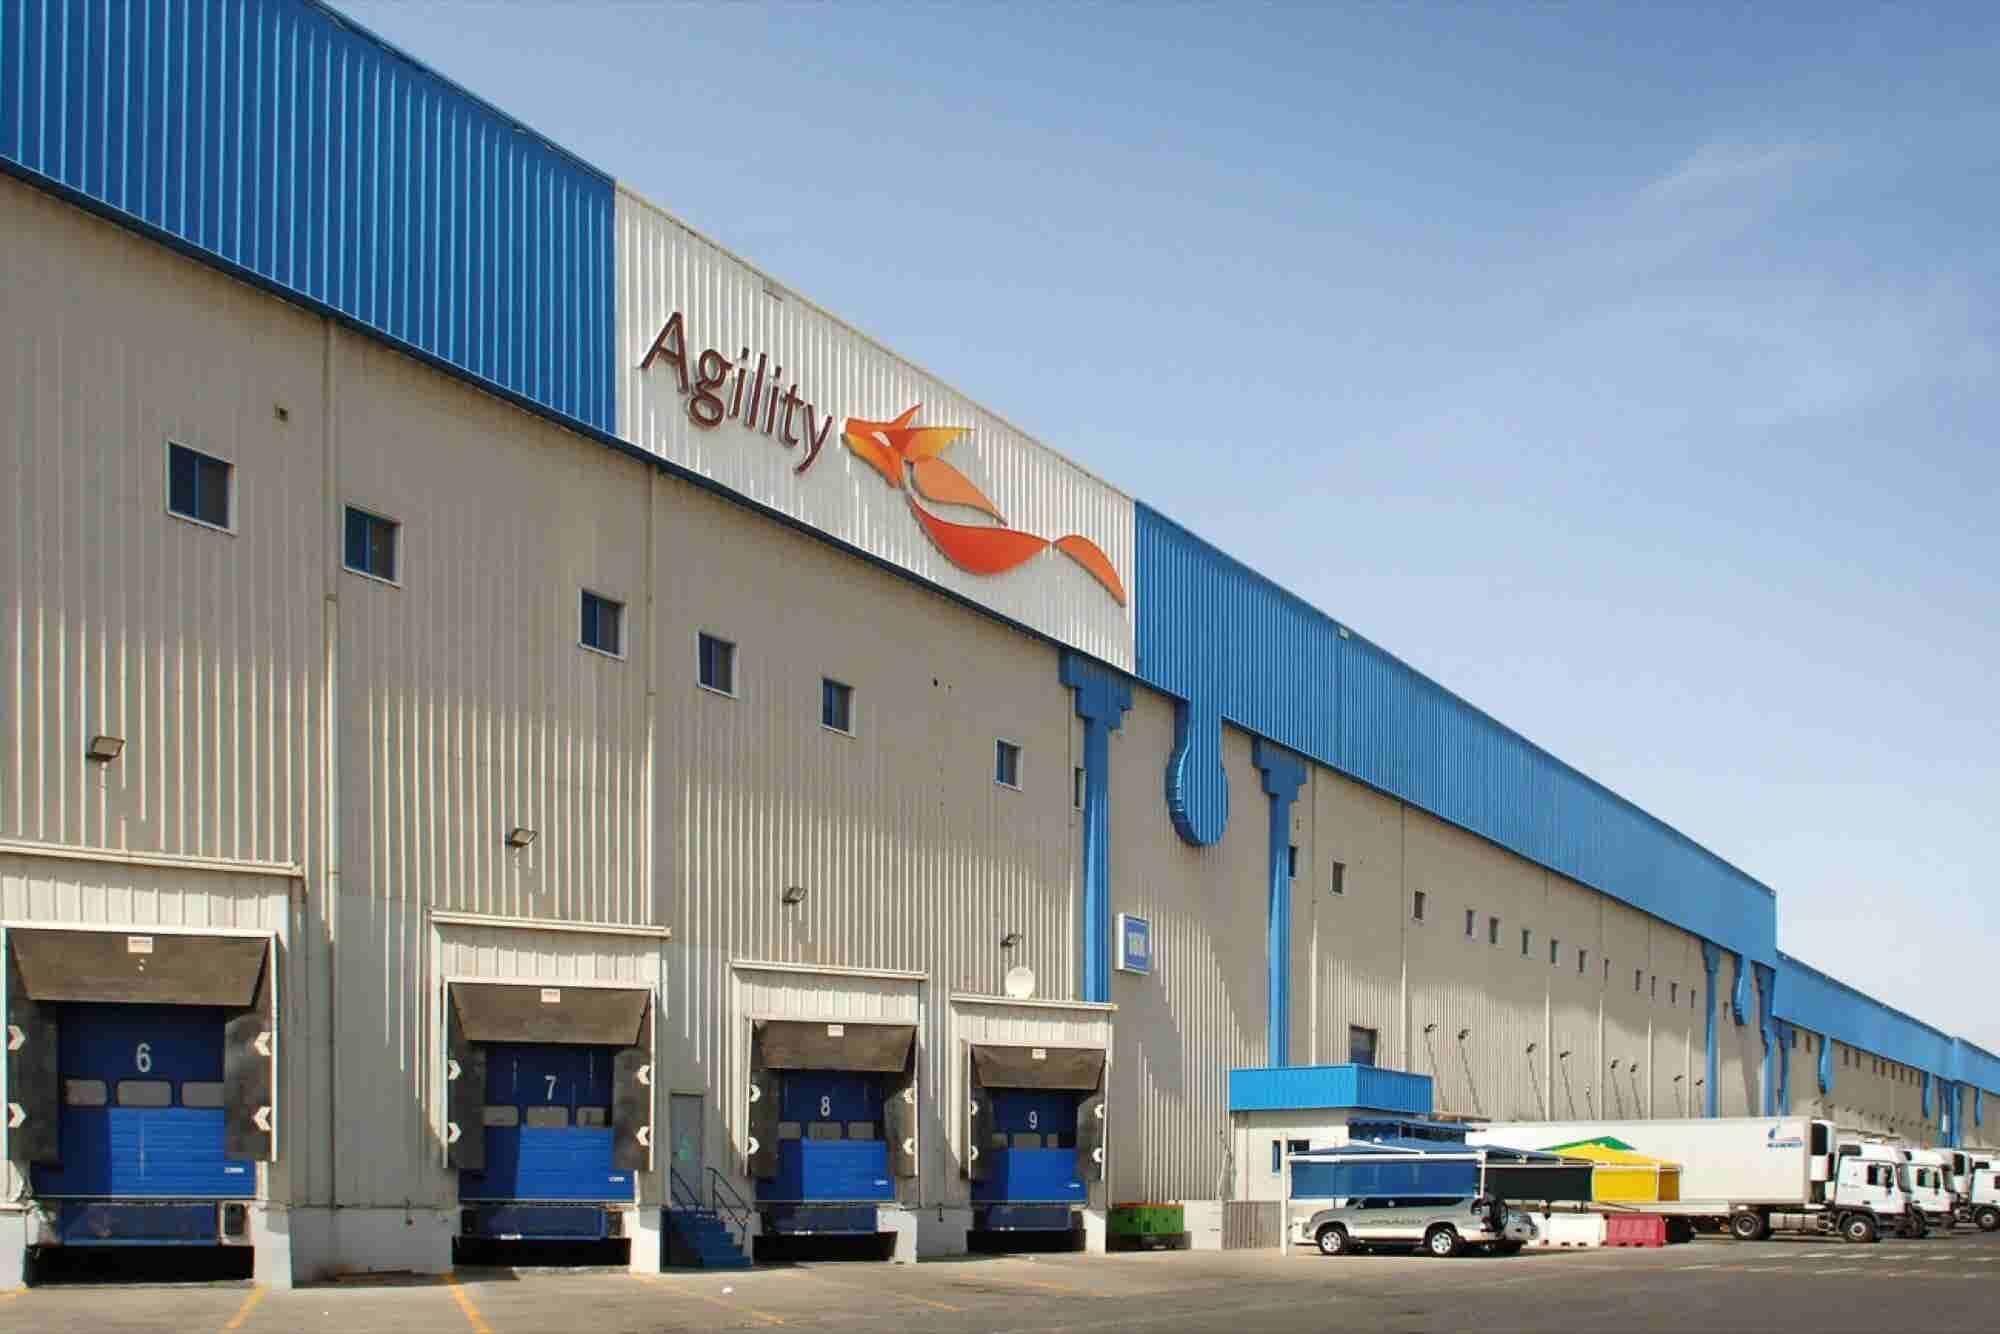 How Kuwait-Based Logistics Giant Agility Is Embracing Digital Disruption